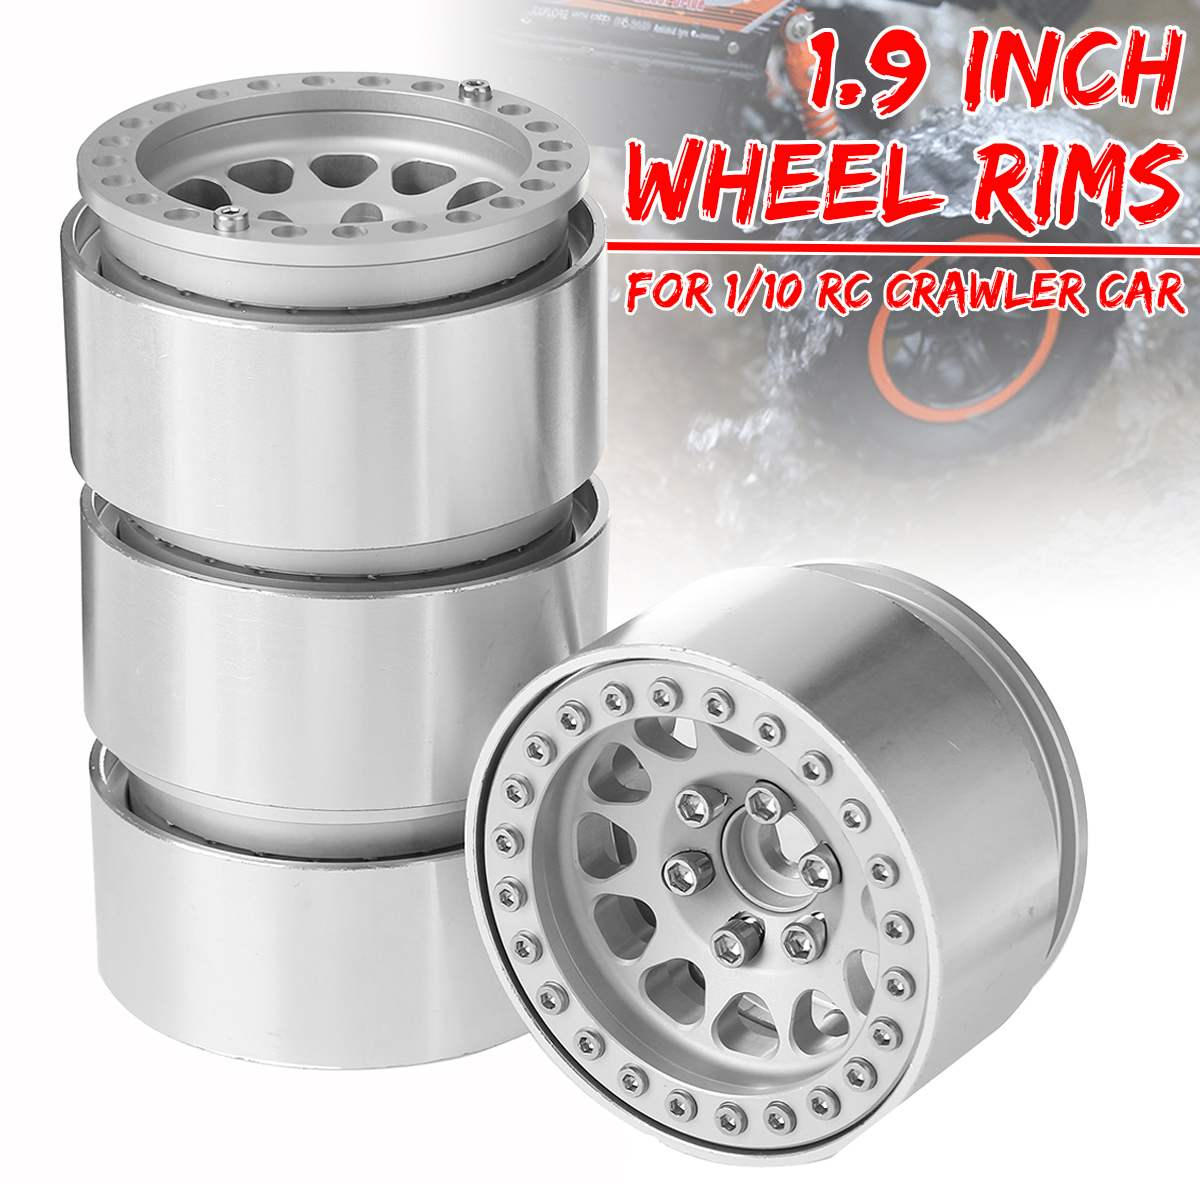 4 Pcs Aluminium Legierung 1,9 Zoll Beadlock Räder Felgen für 1/10 RC Crawler Auto Axial SCX10 SCX10 II 90046 Tamiya CC01 TRX4 D90